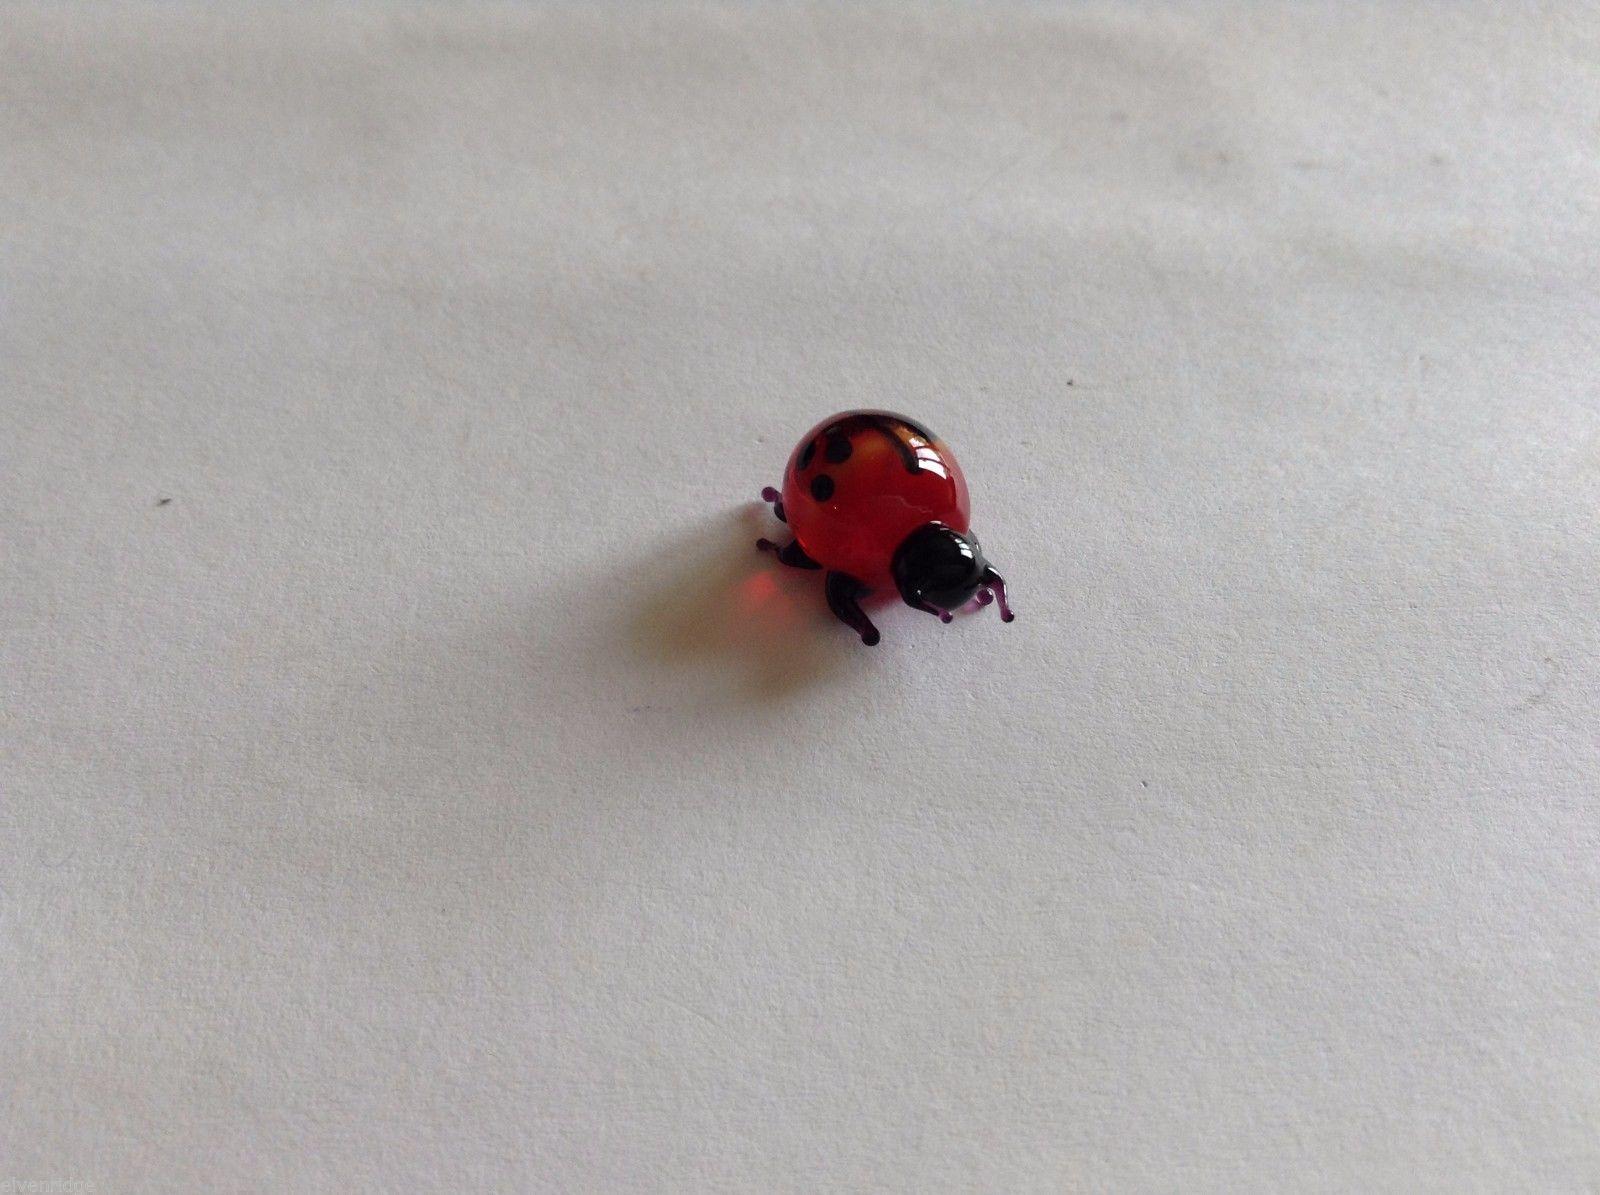 Micro Miniature small hand blown glass made USA cute ladybug